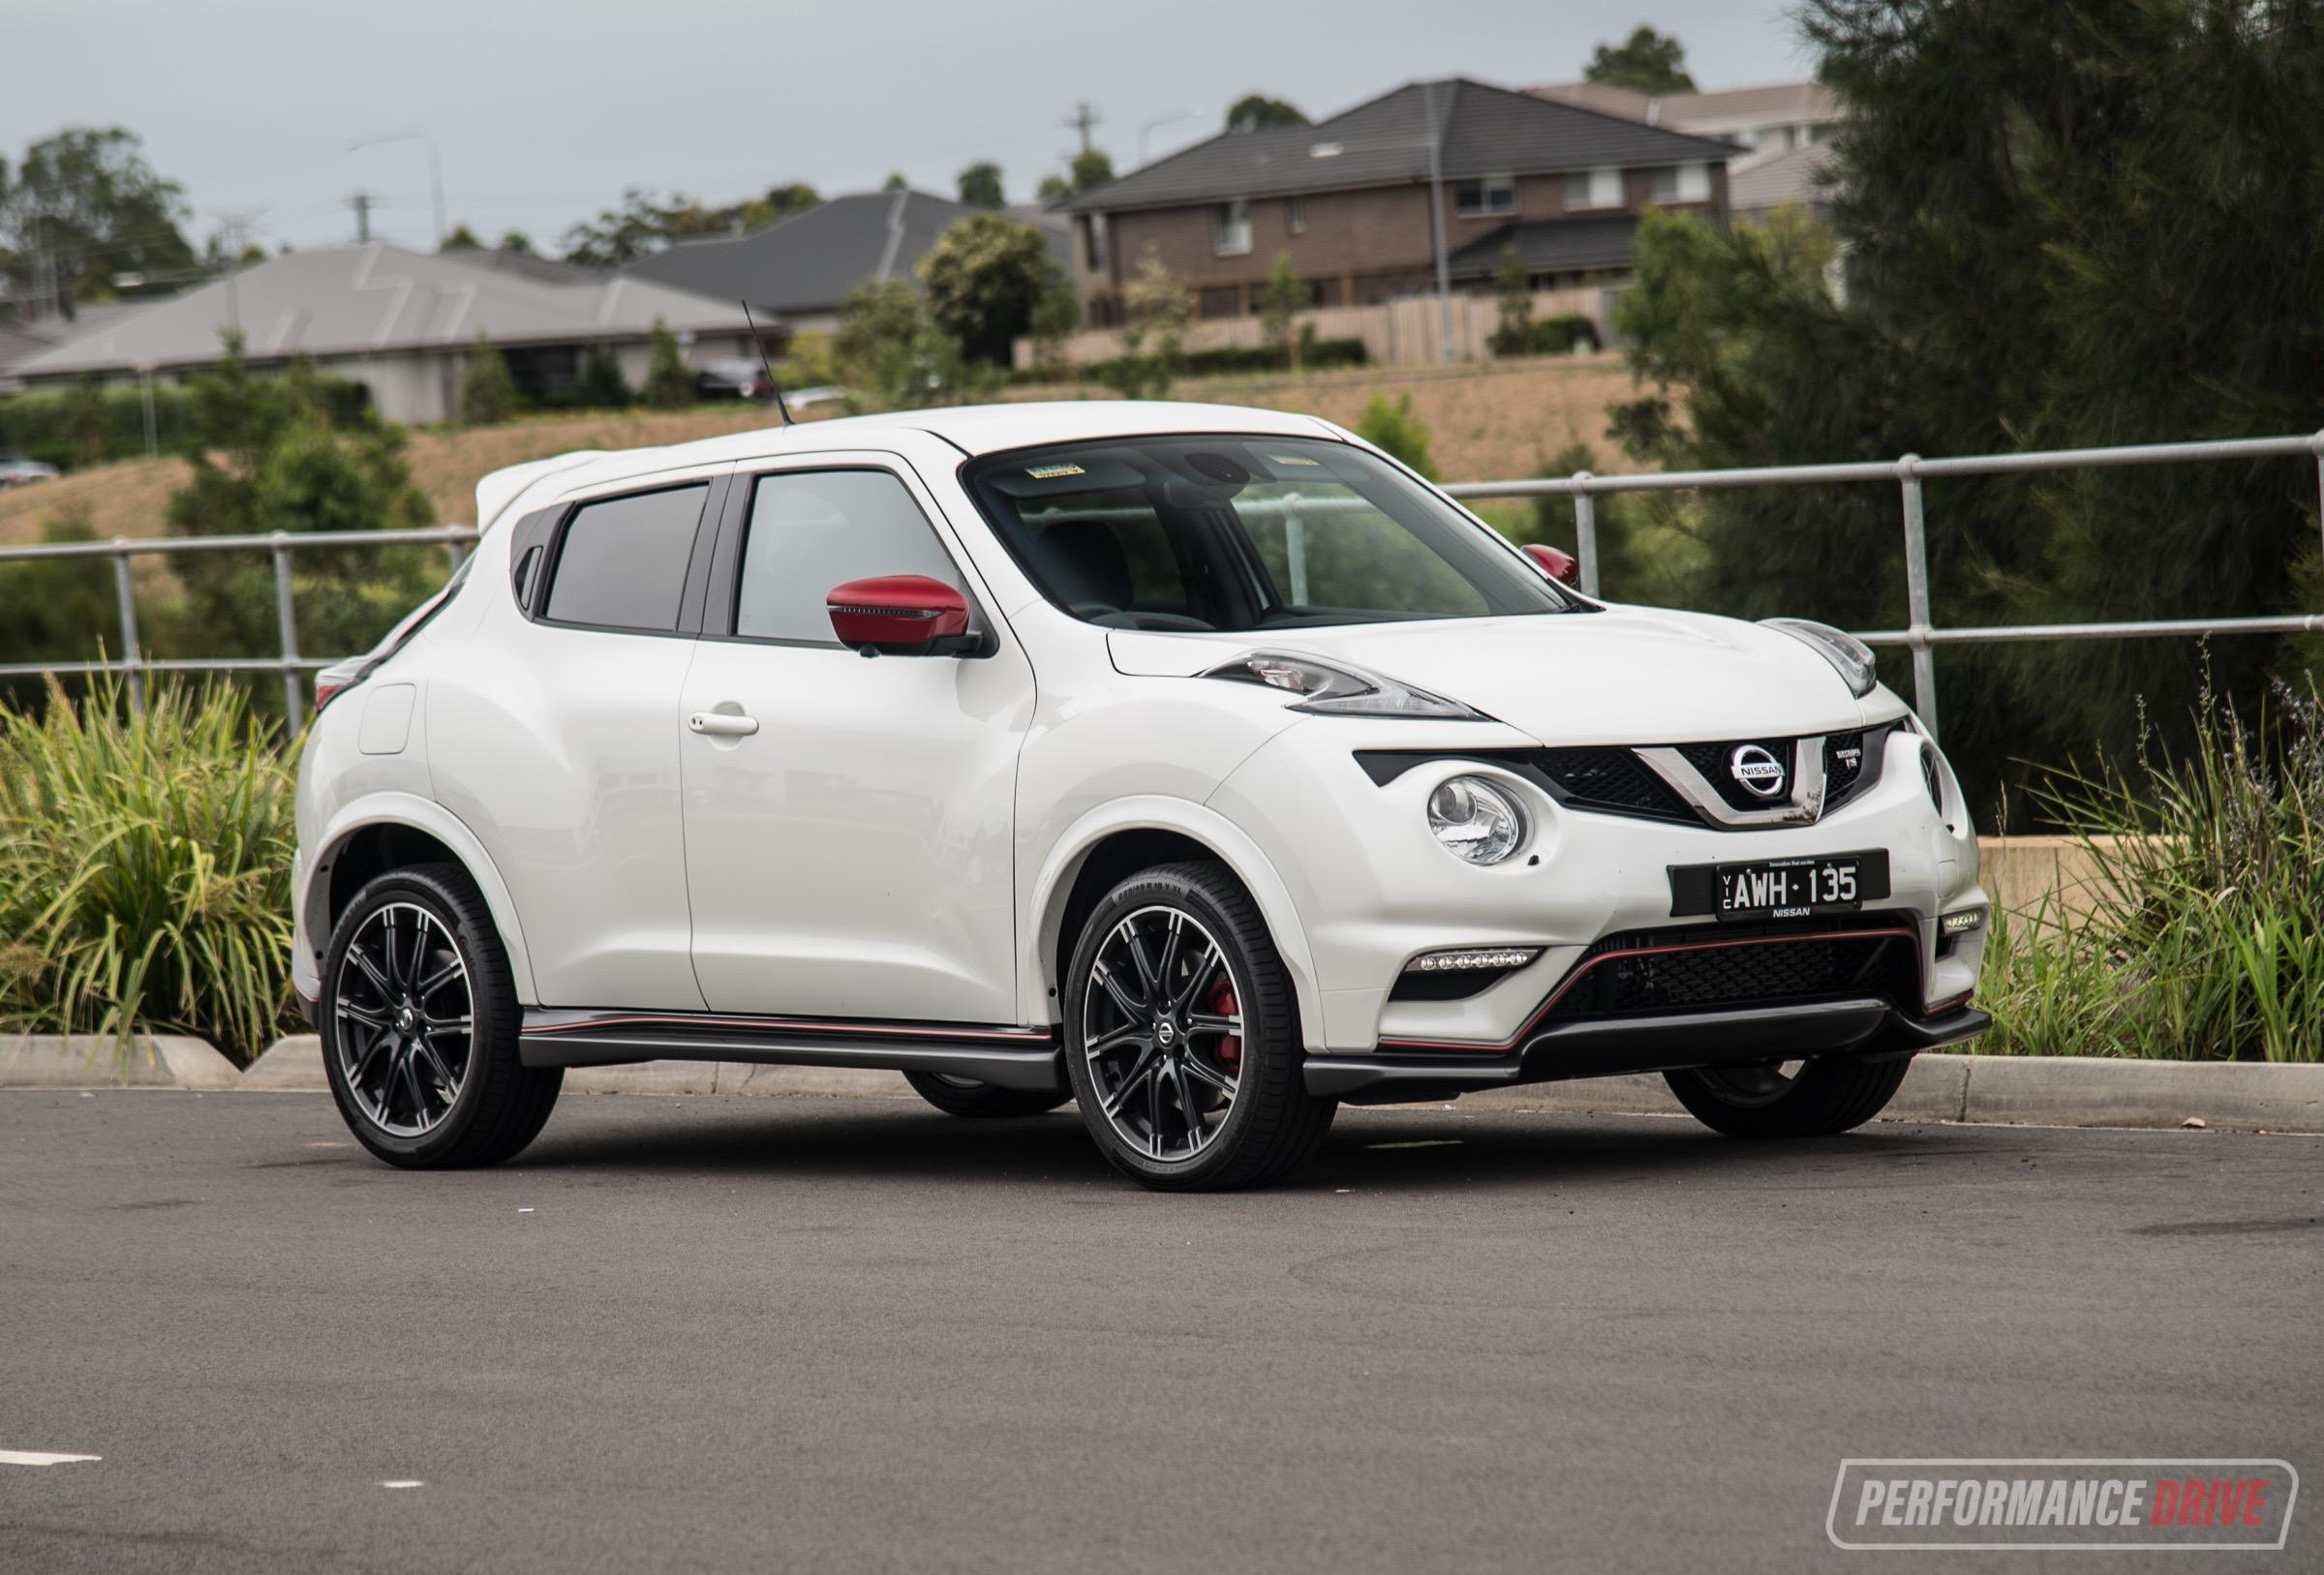 Nissan Juke Nismo Rs >> 2018 Nissan Juke Nismo Rs Review Video Performancedrive